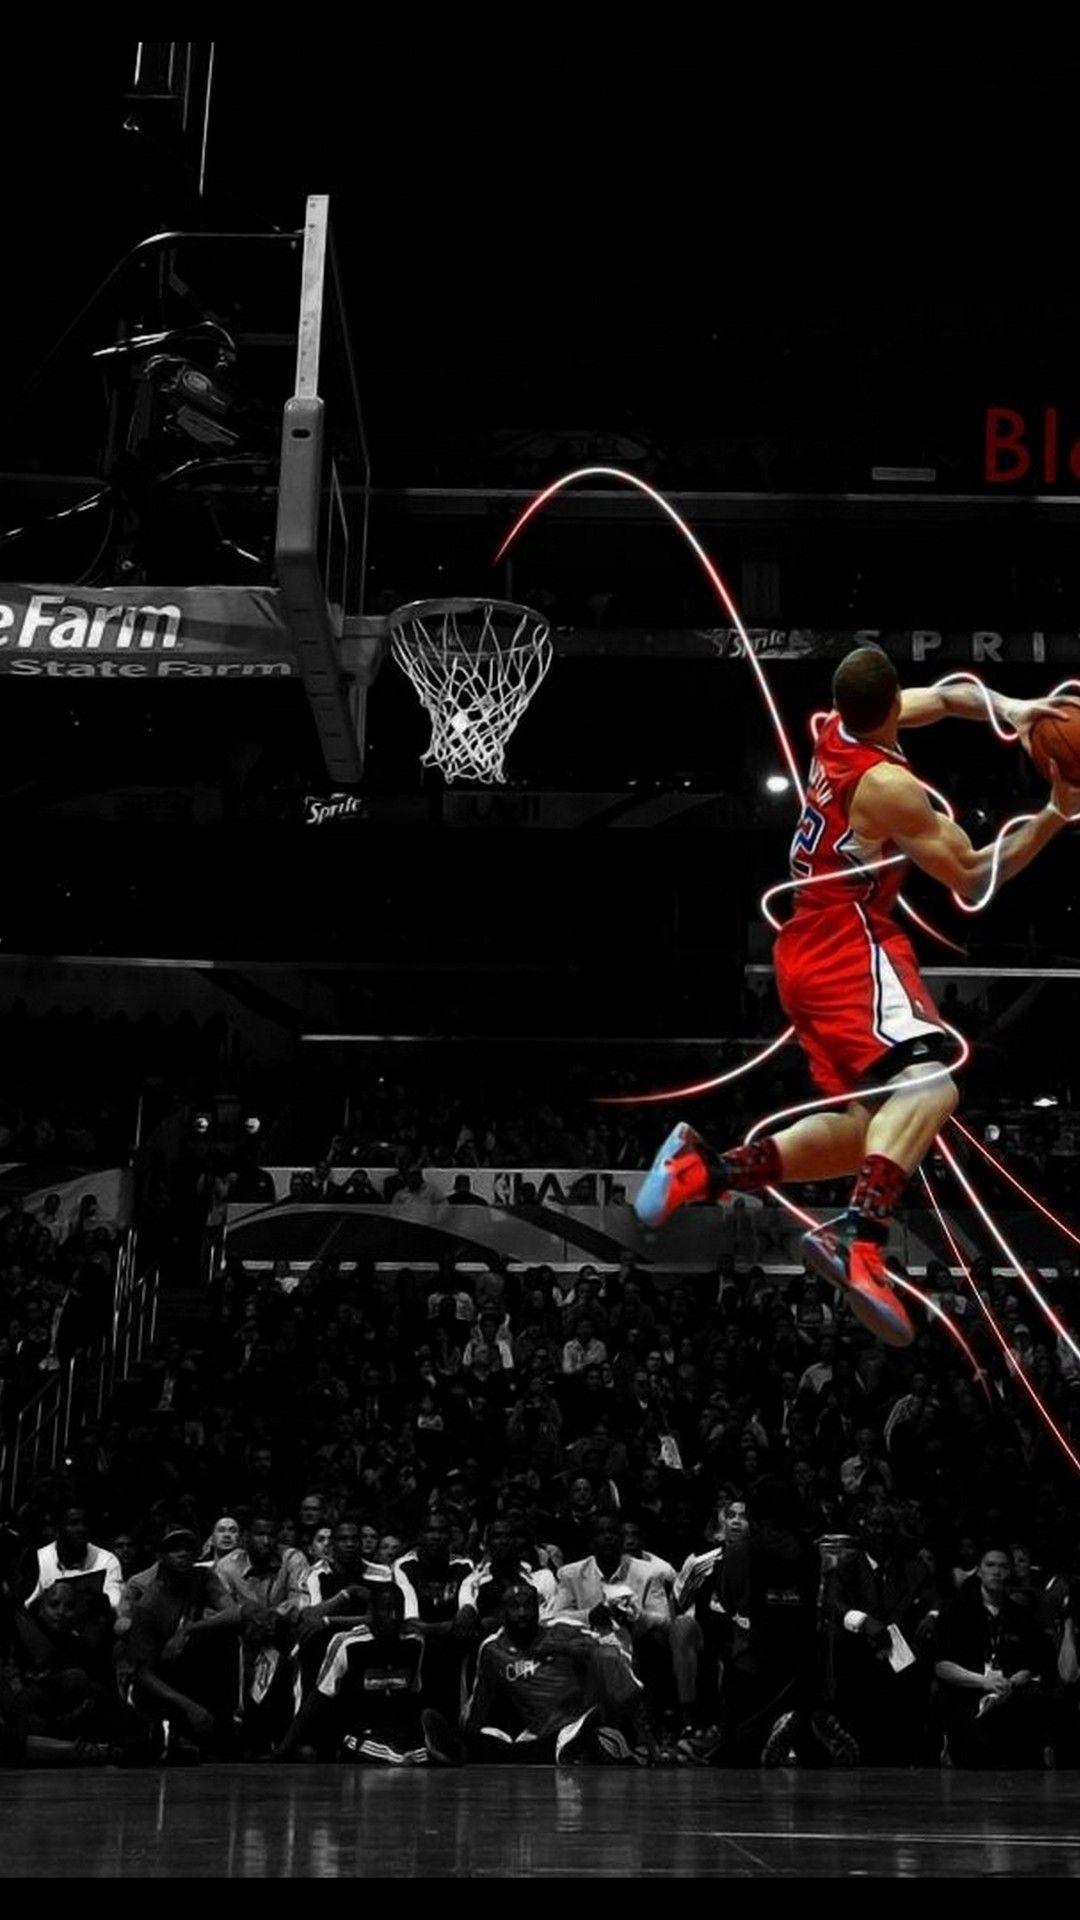 Nba Basketball Iphone 7 Plus Wallpaper 7 Plus Wallpaper Iphone